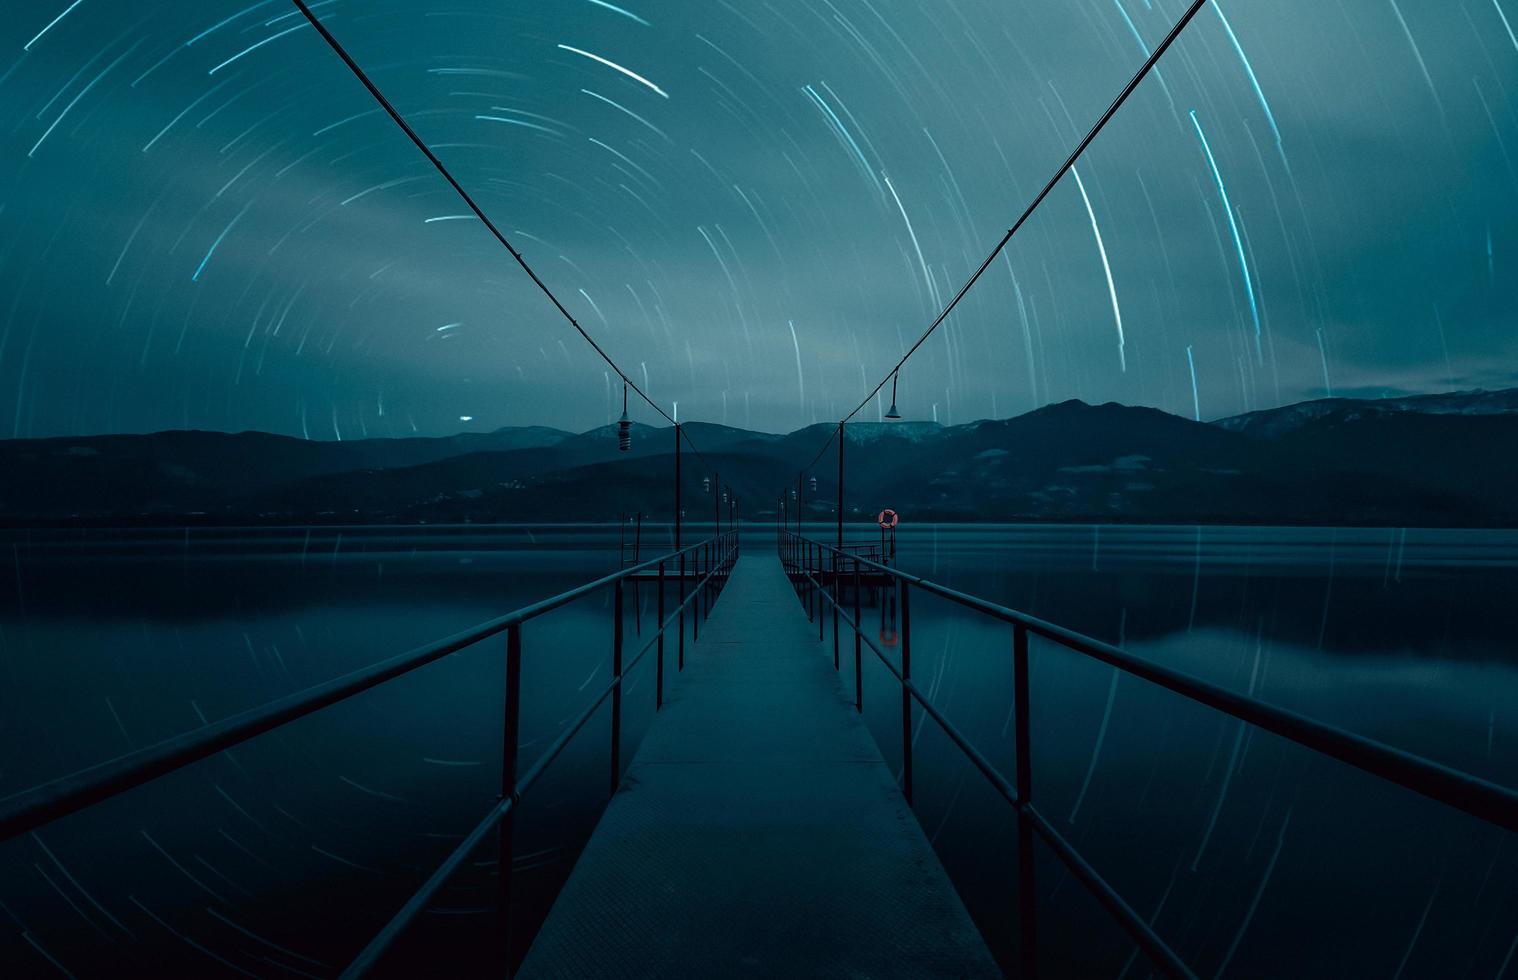 Star trails over seascape bridge at blue hour photo